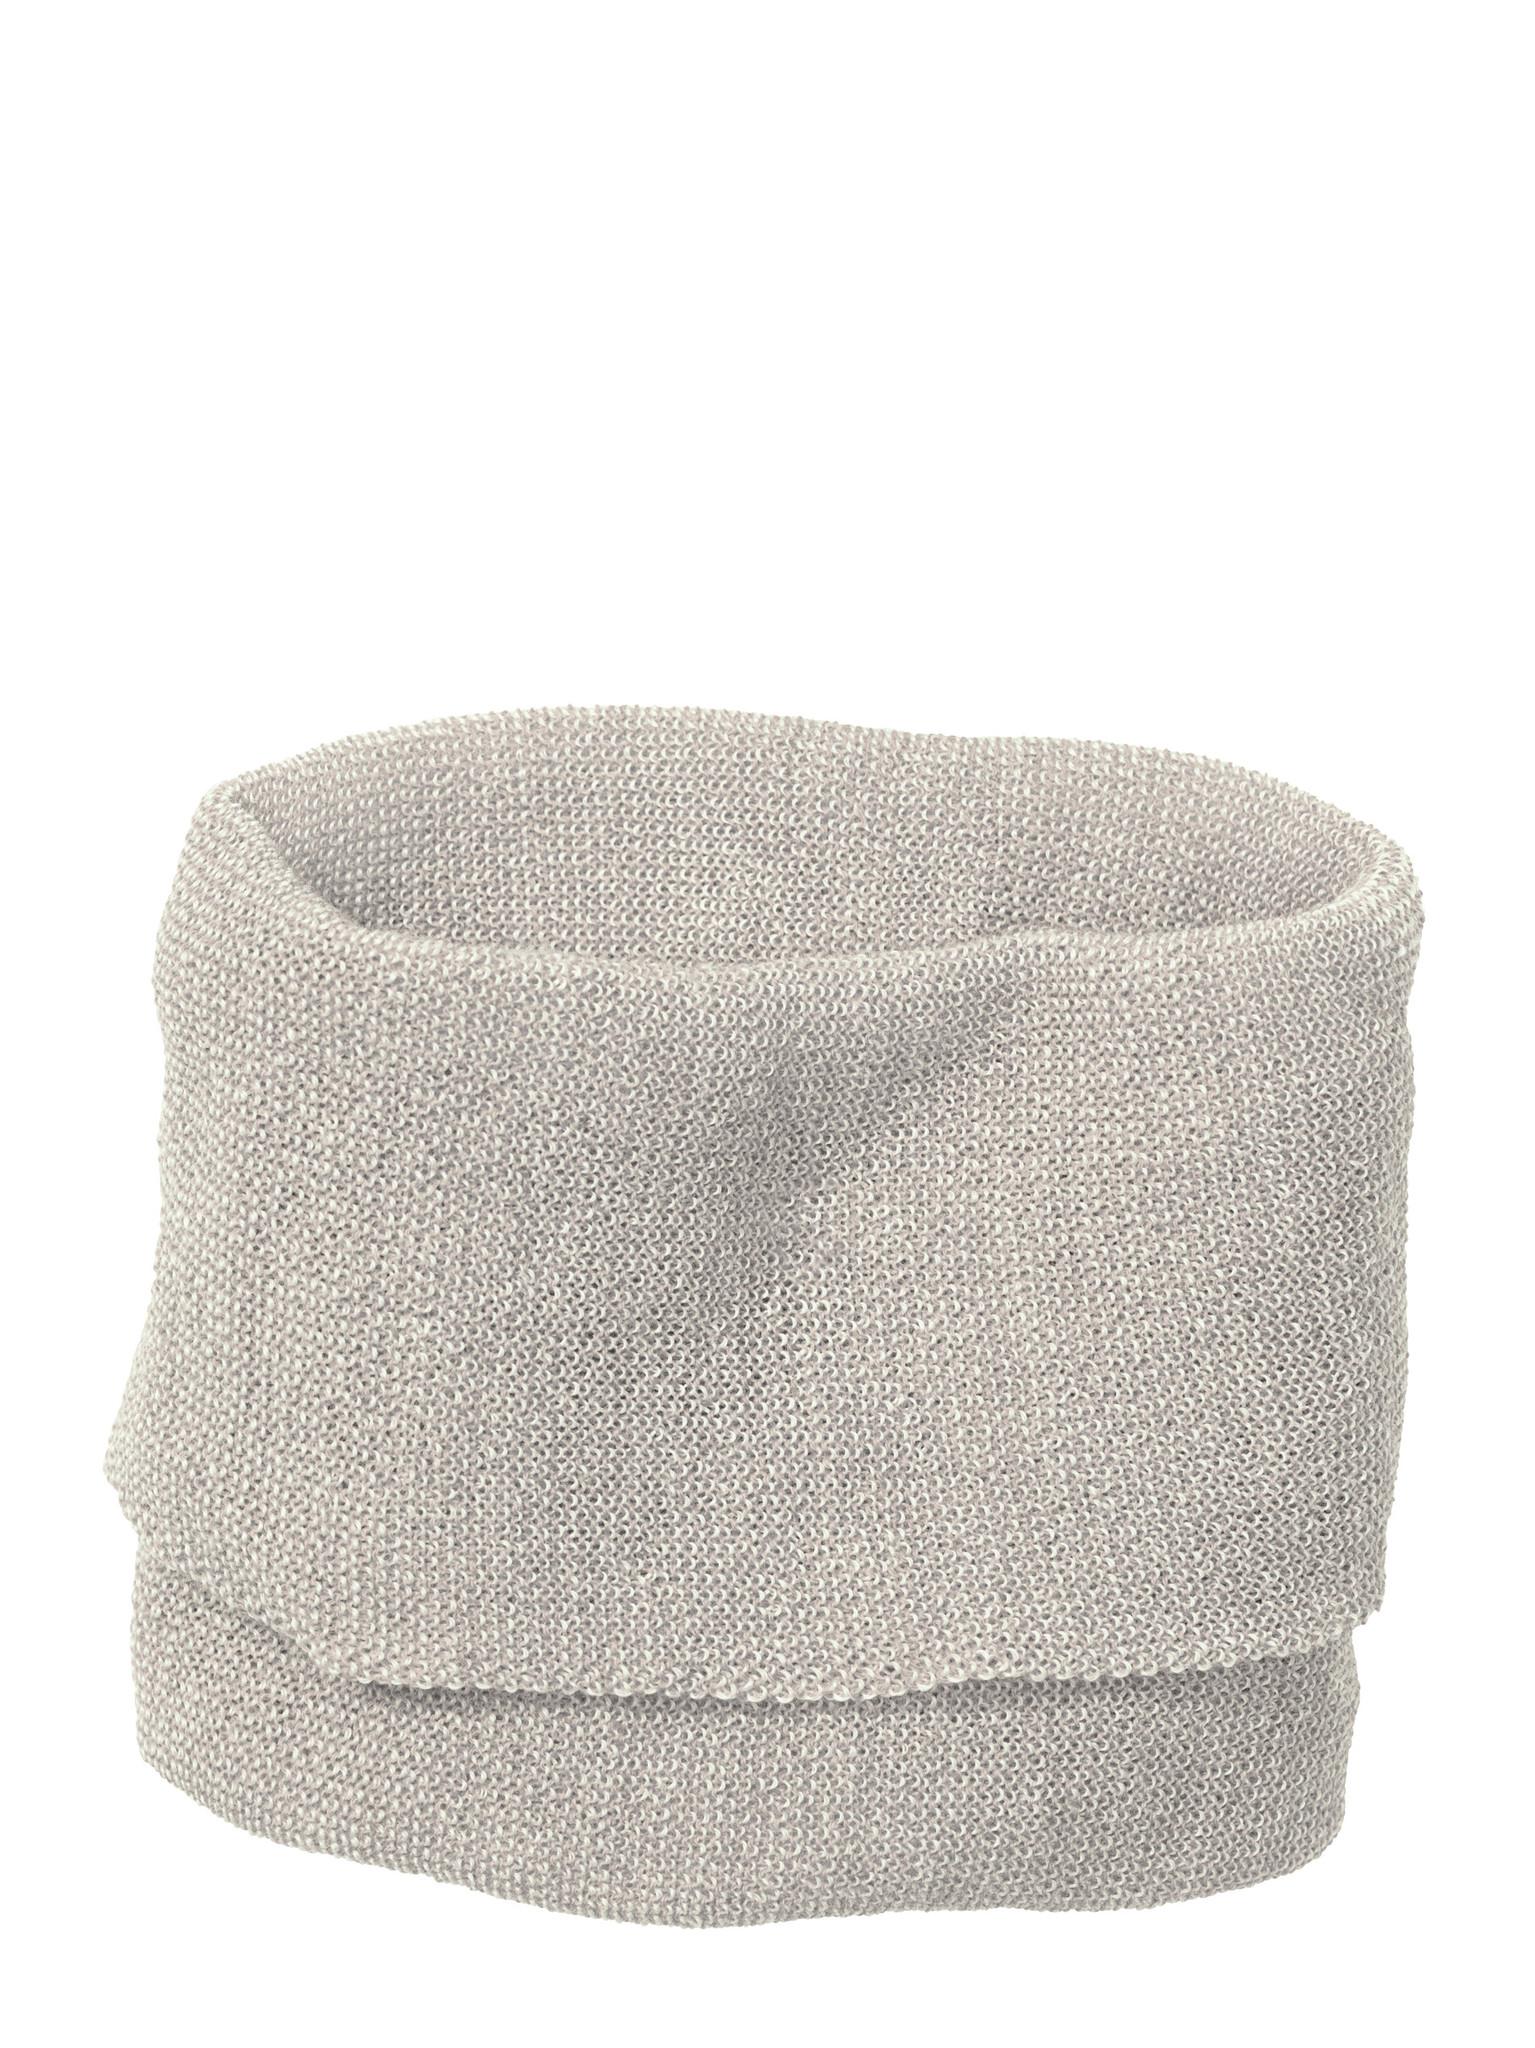 Disana Disana Tube scarf -100% wol - Grijs/Naturel (911)